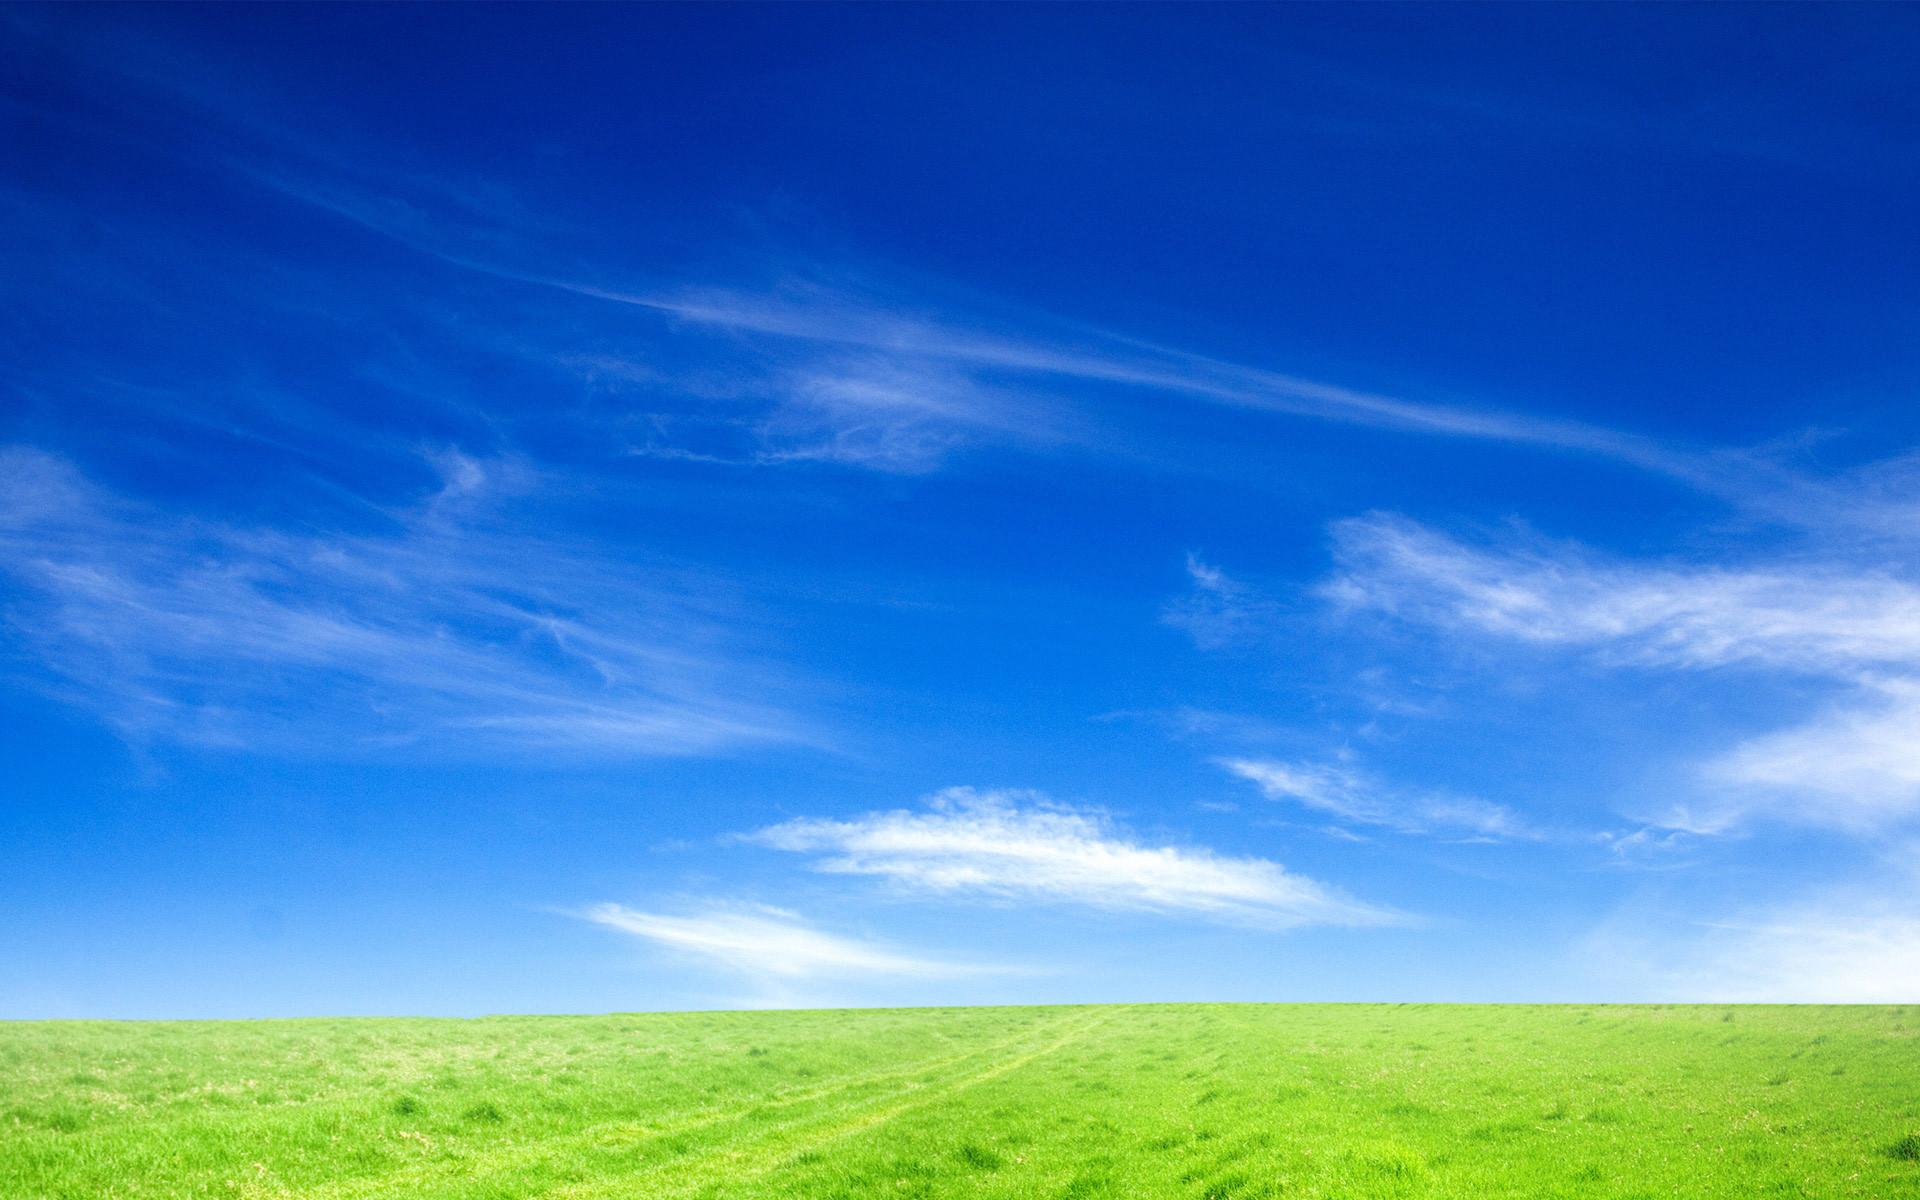 Blue Sky and Green Grass HD wallpaper thumb